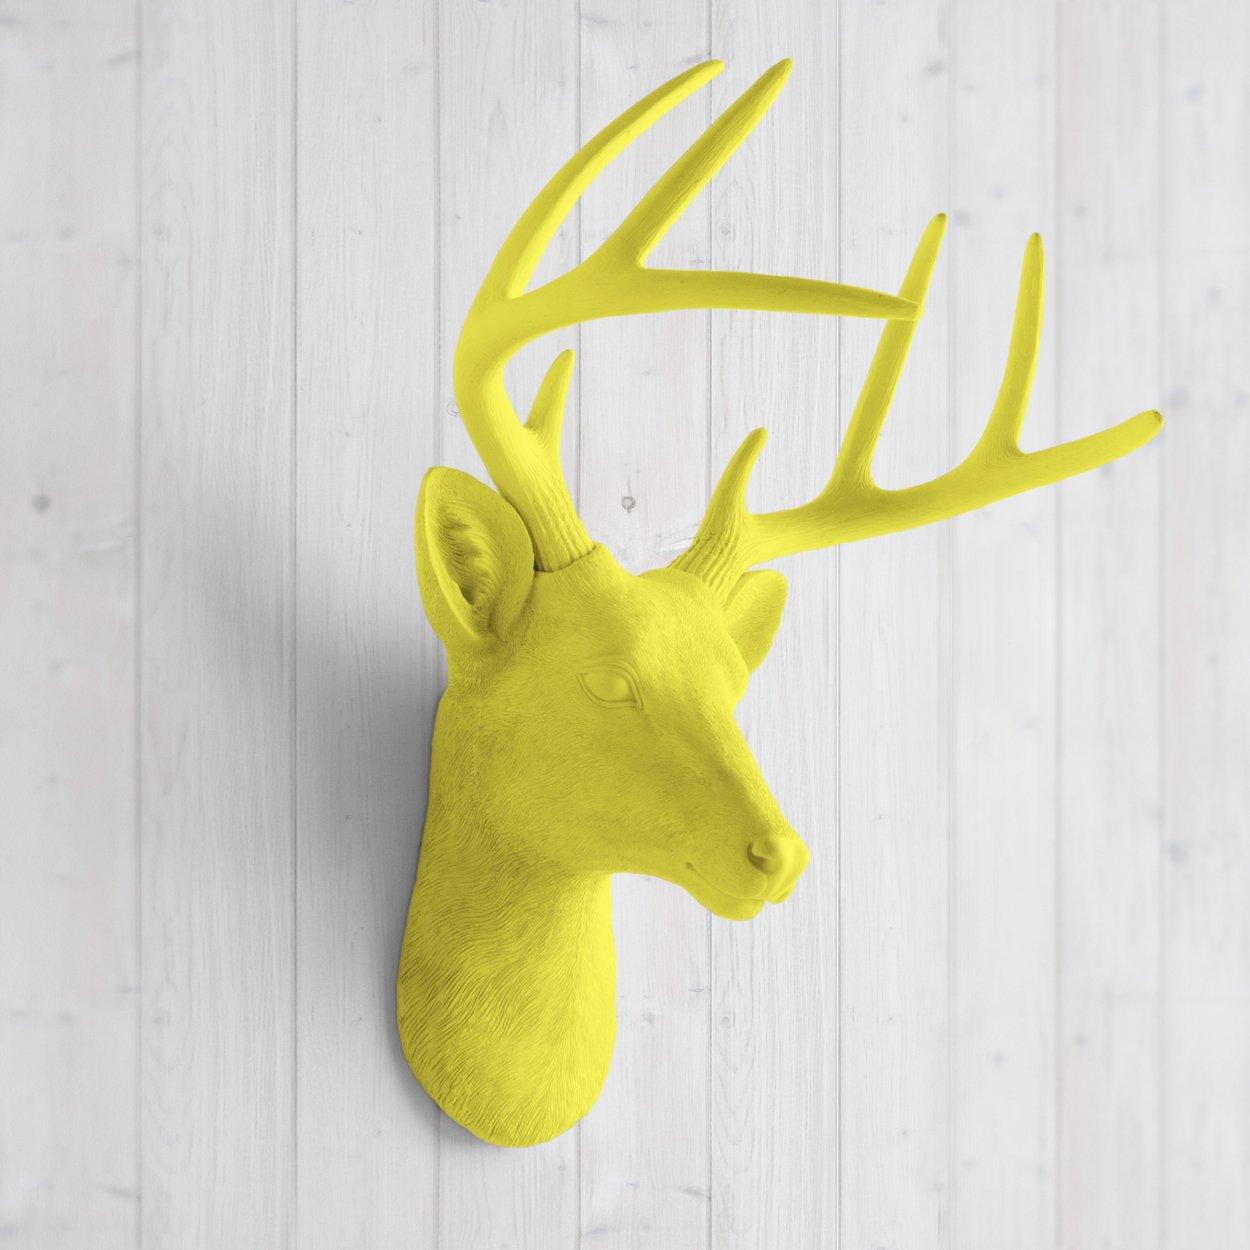 Amazon.com: Deer Head by Wall Charmers | Yellow Faux Head Mount ...